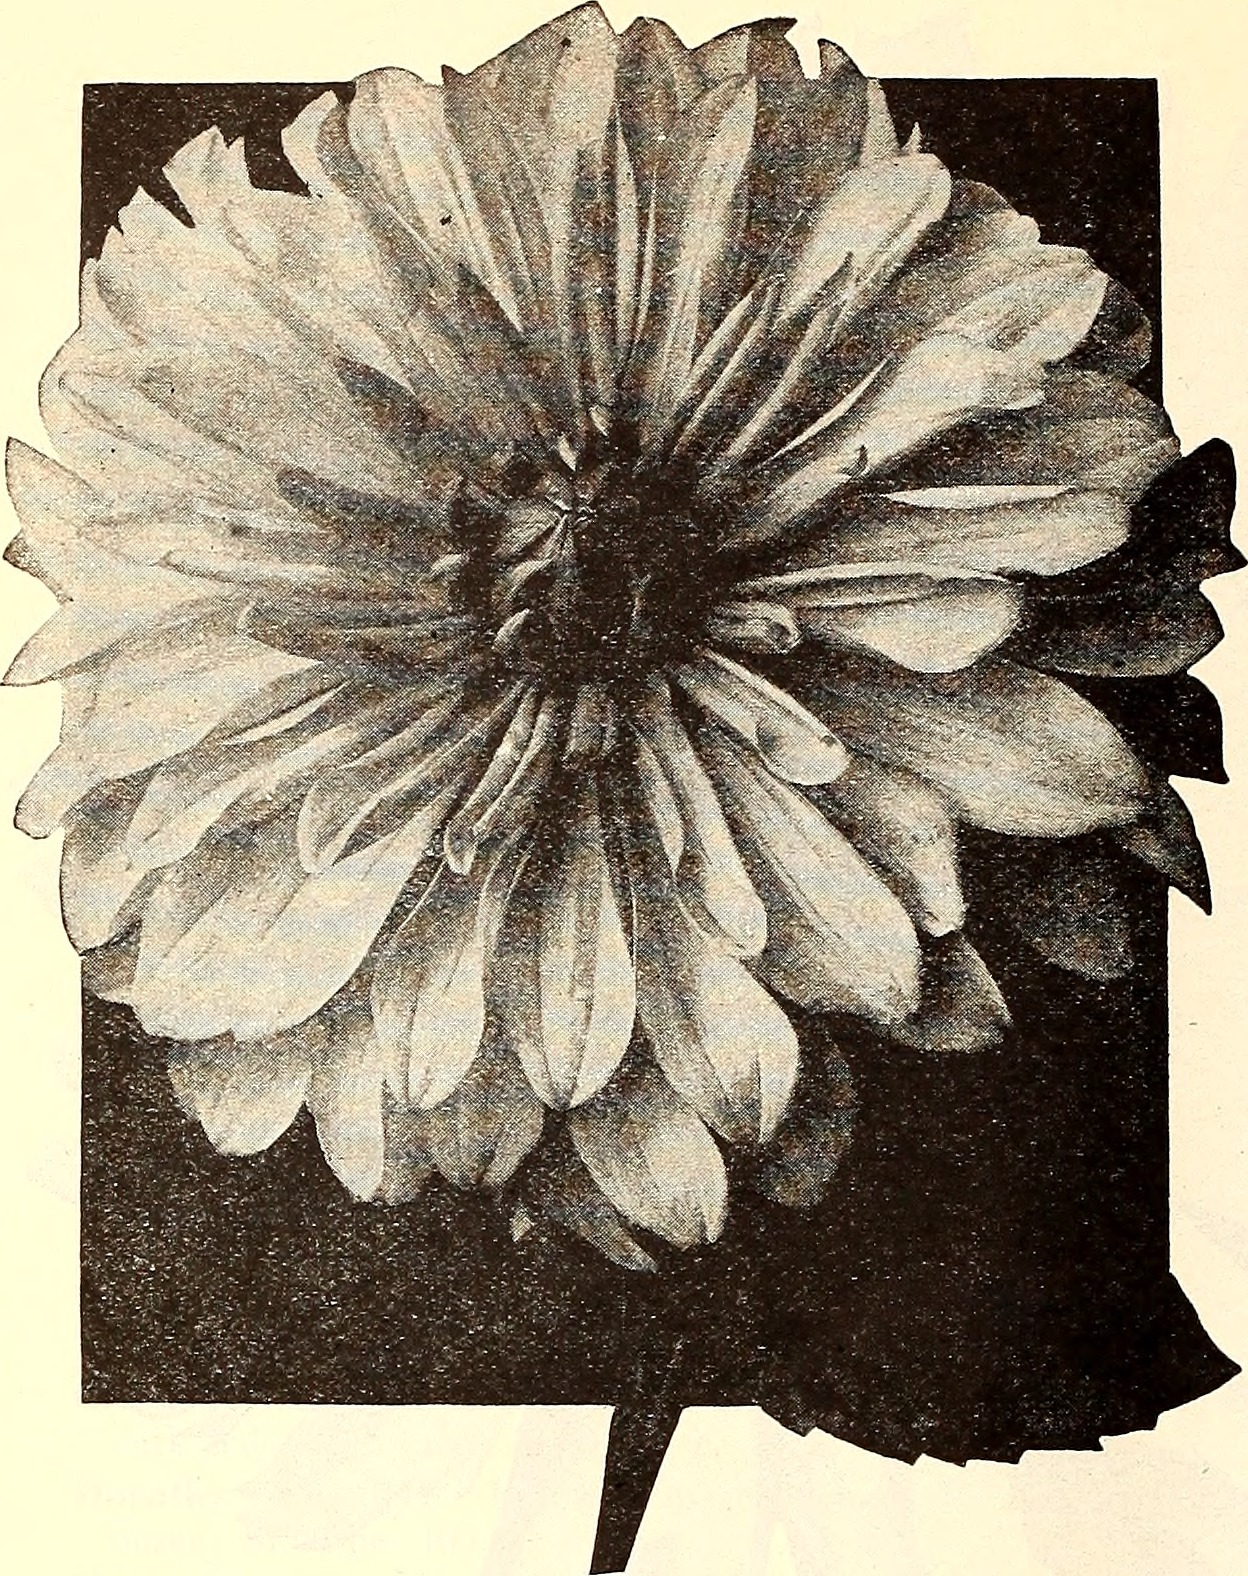 California gardening (1929) (20506201462).jpg English: Title: California gardening Identifier: californiagarden1929germ (find matches) Year: